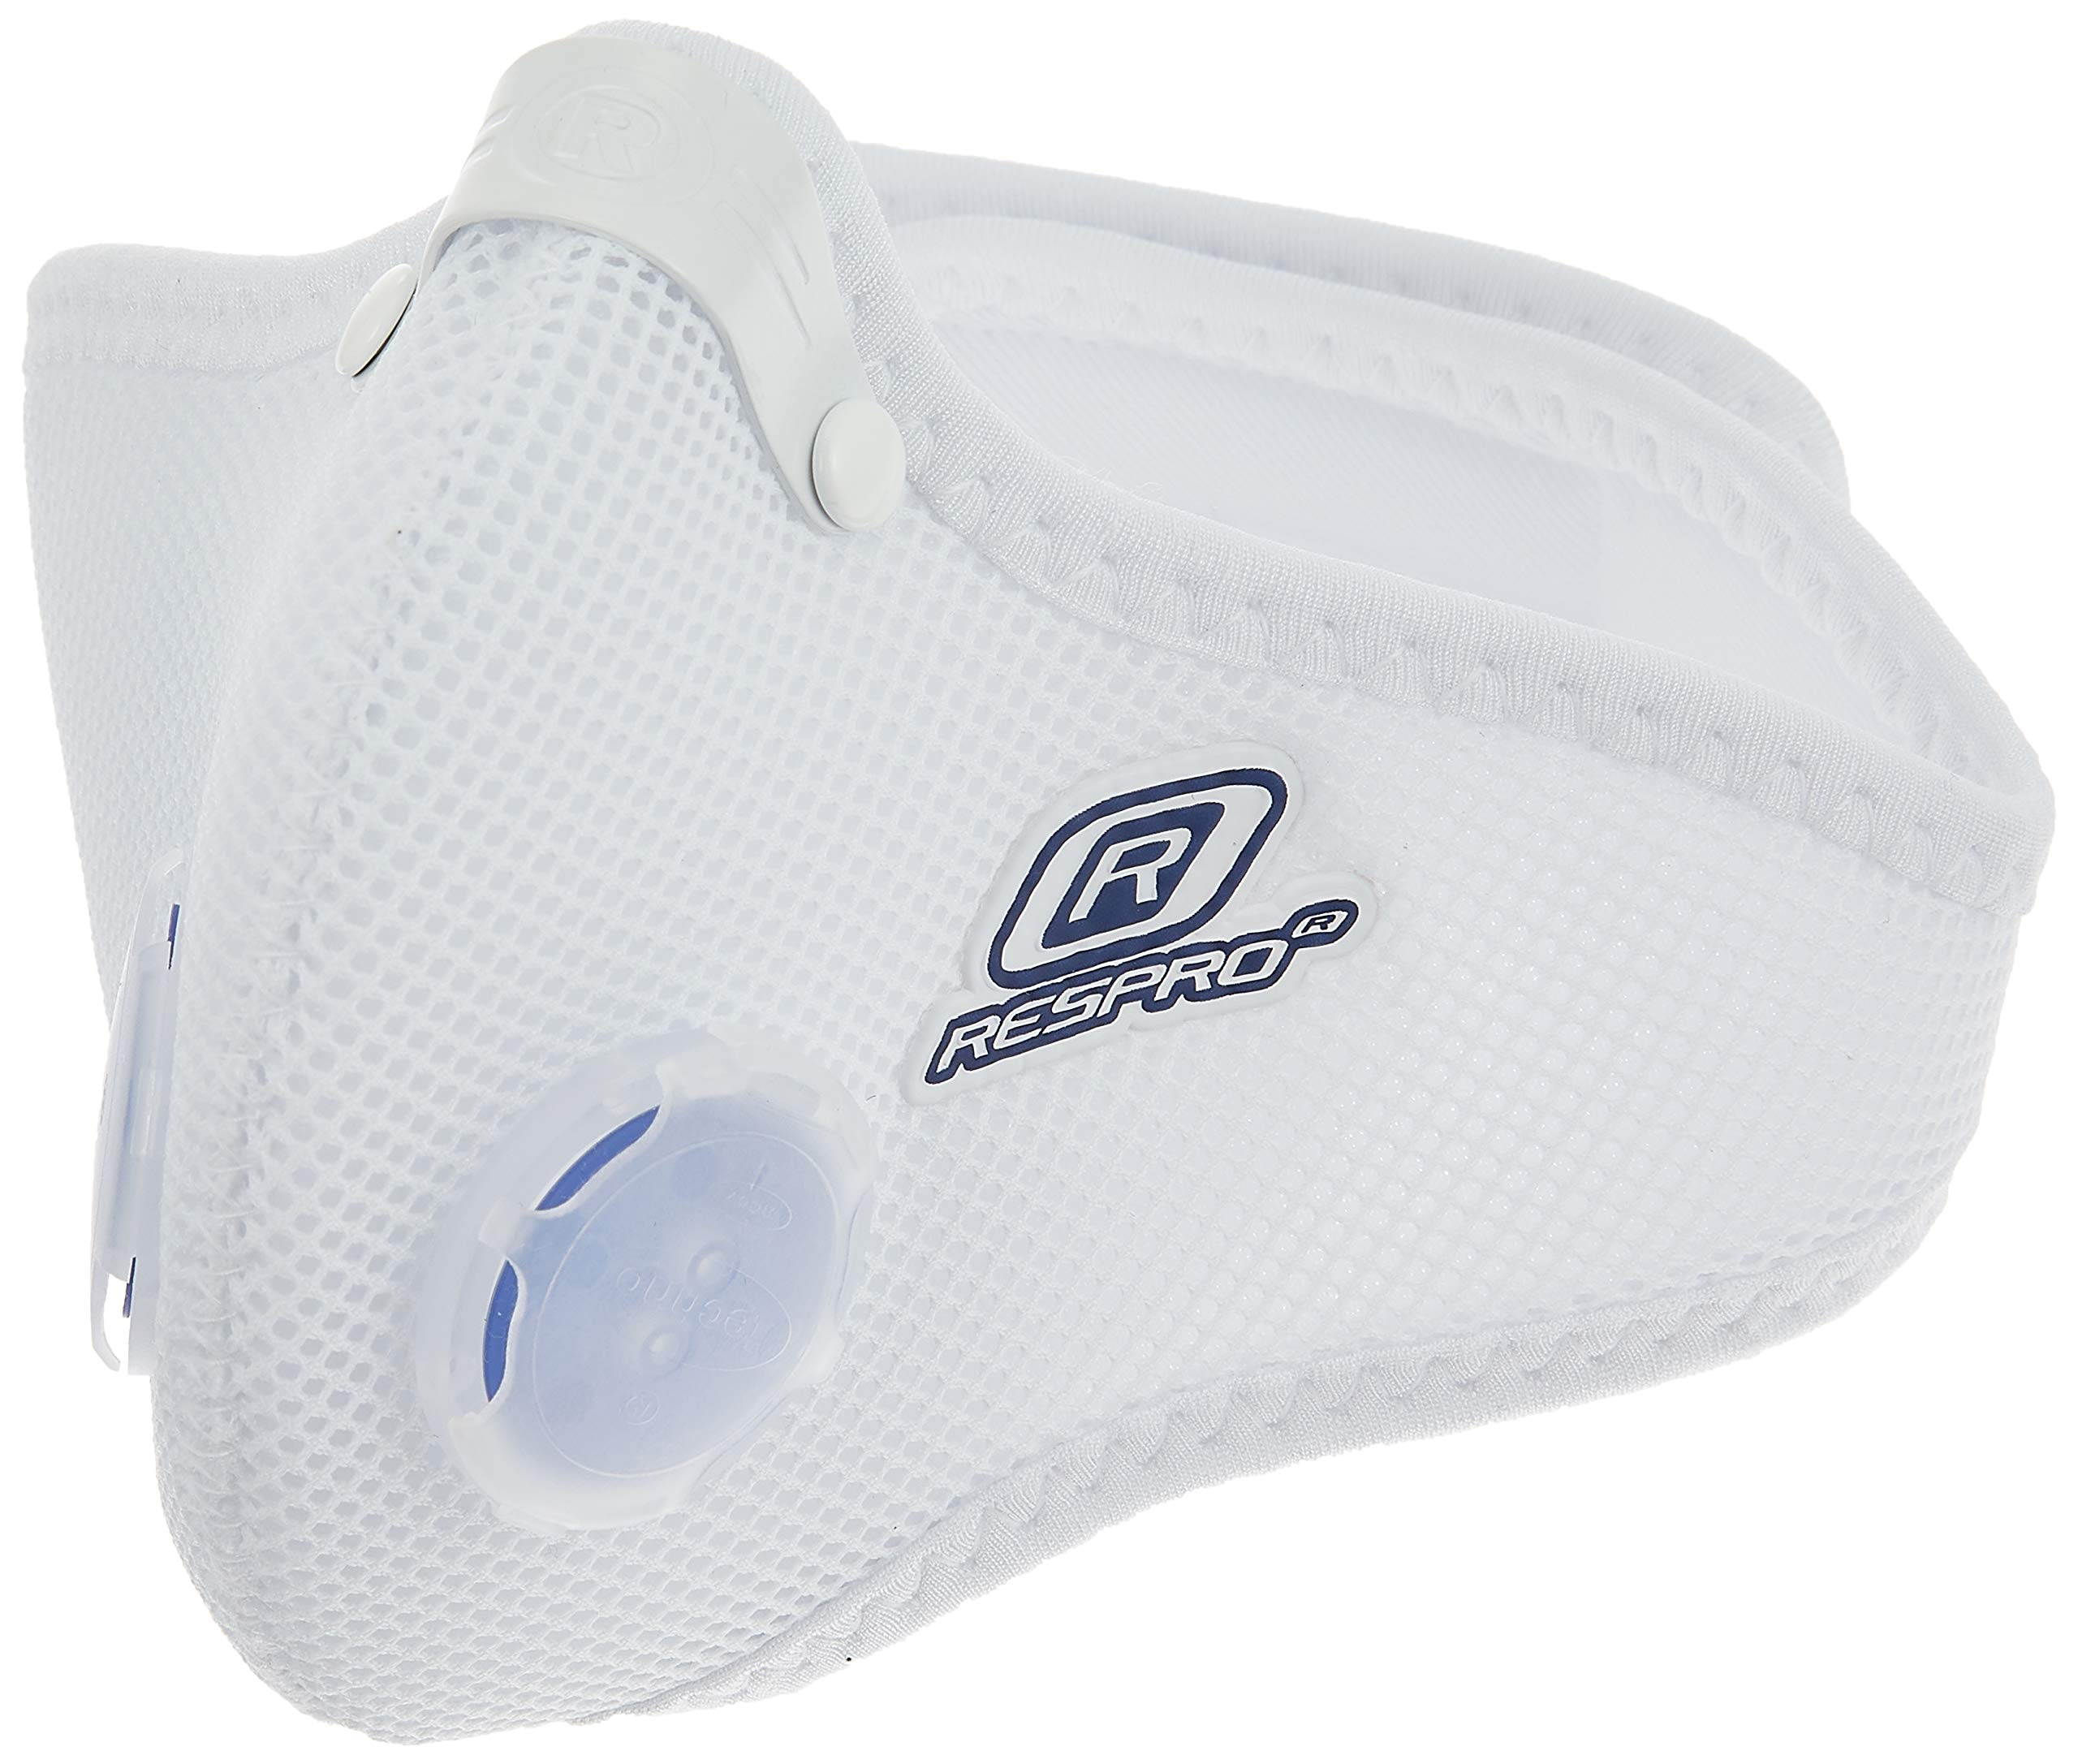 RESPRO allergy model ultralight polyester aero / allergy mask White M by Respro